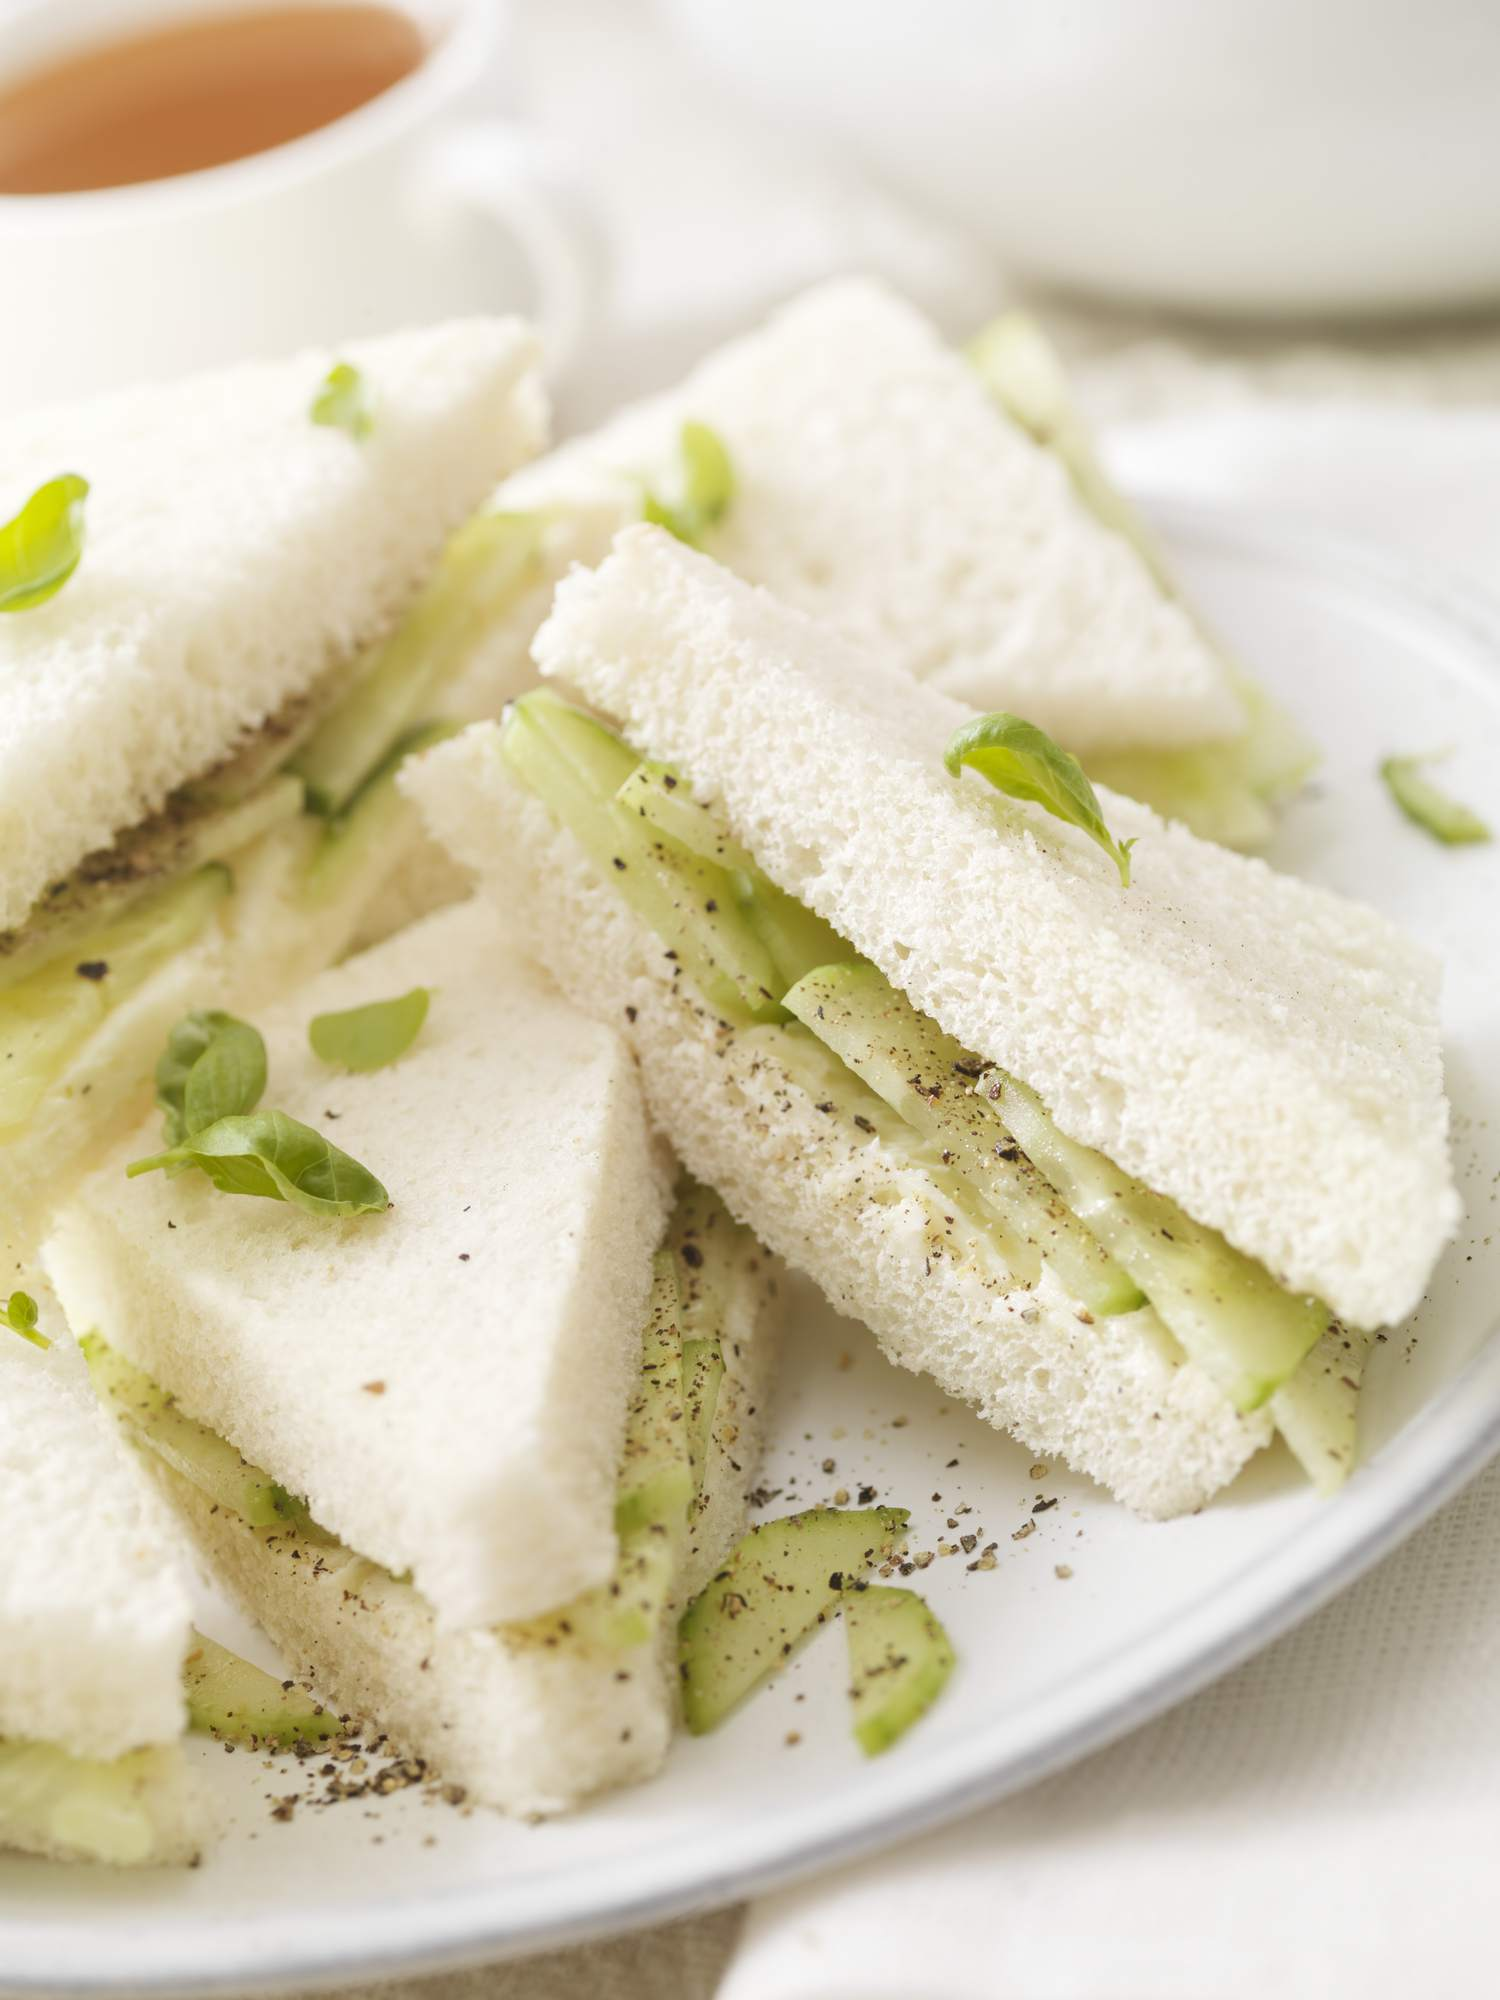 Crustless English cucumber sandwiches with butter, salt, pepper and fresh herbs